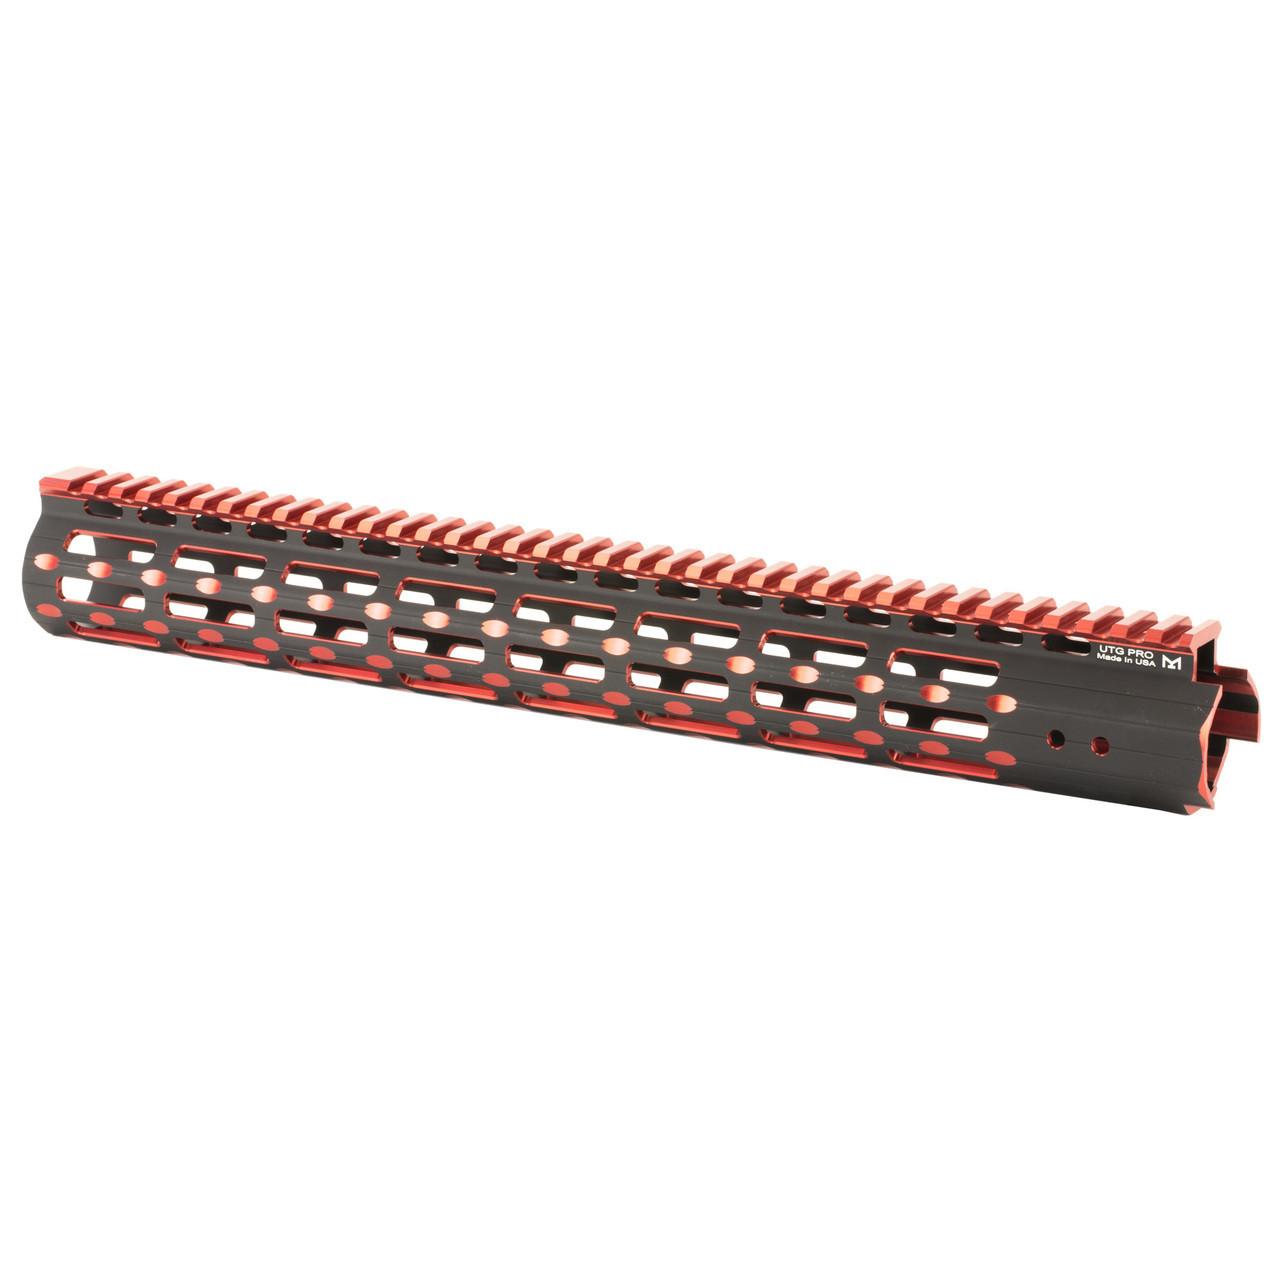 Leapers, Inc  - UTG UTG PRO, M-Lok Super Slim Free Floating Rail, Black/Red  2-Tone, Fits AR-15, 15